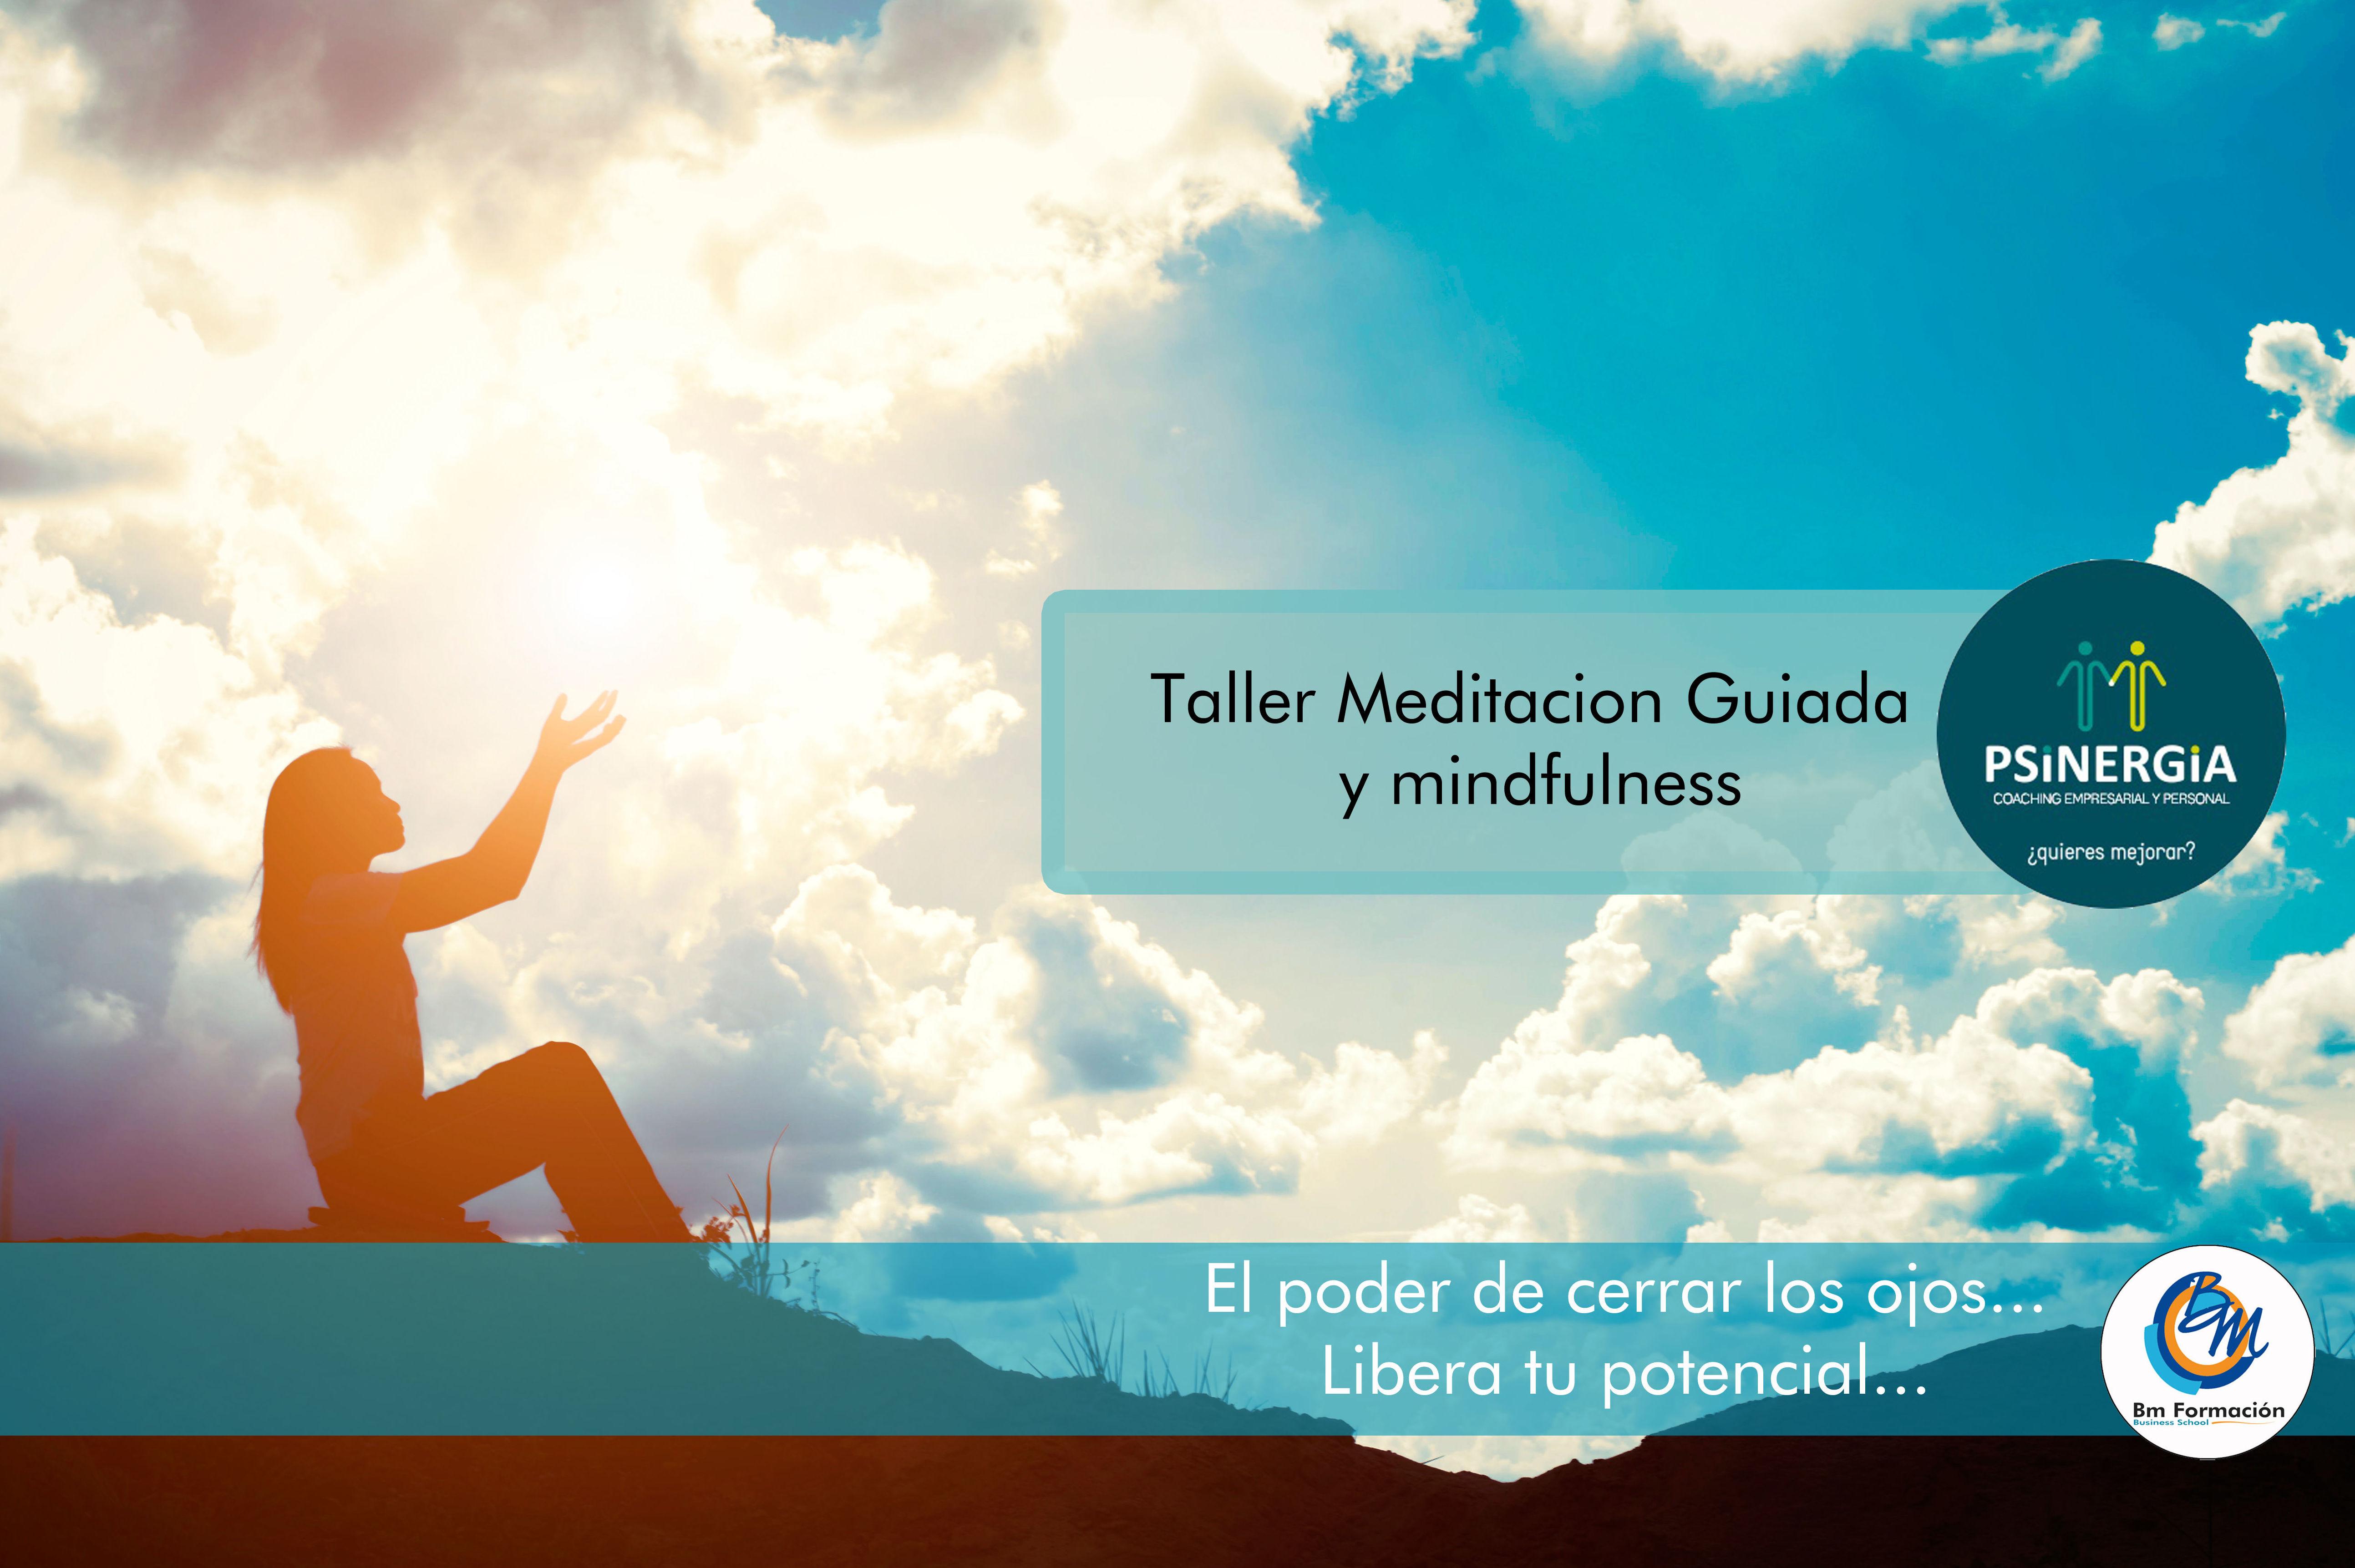 Taller Meditación Guiada y Mindfulness